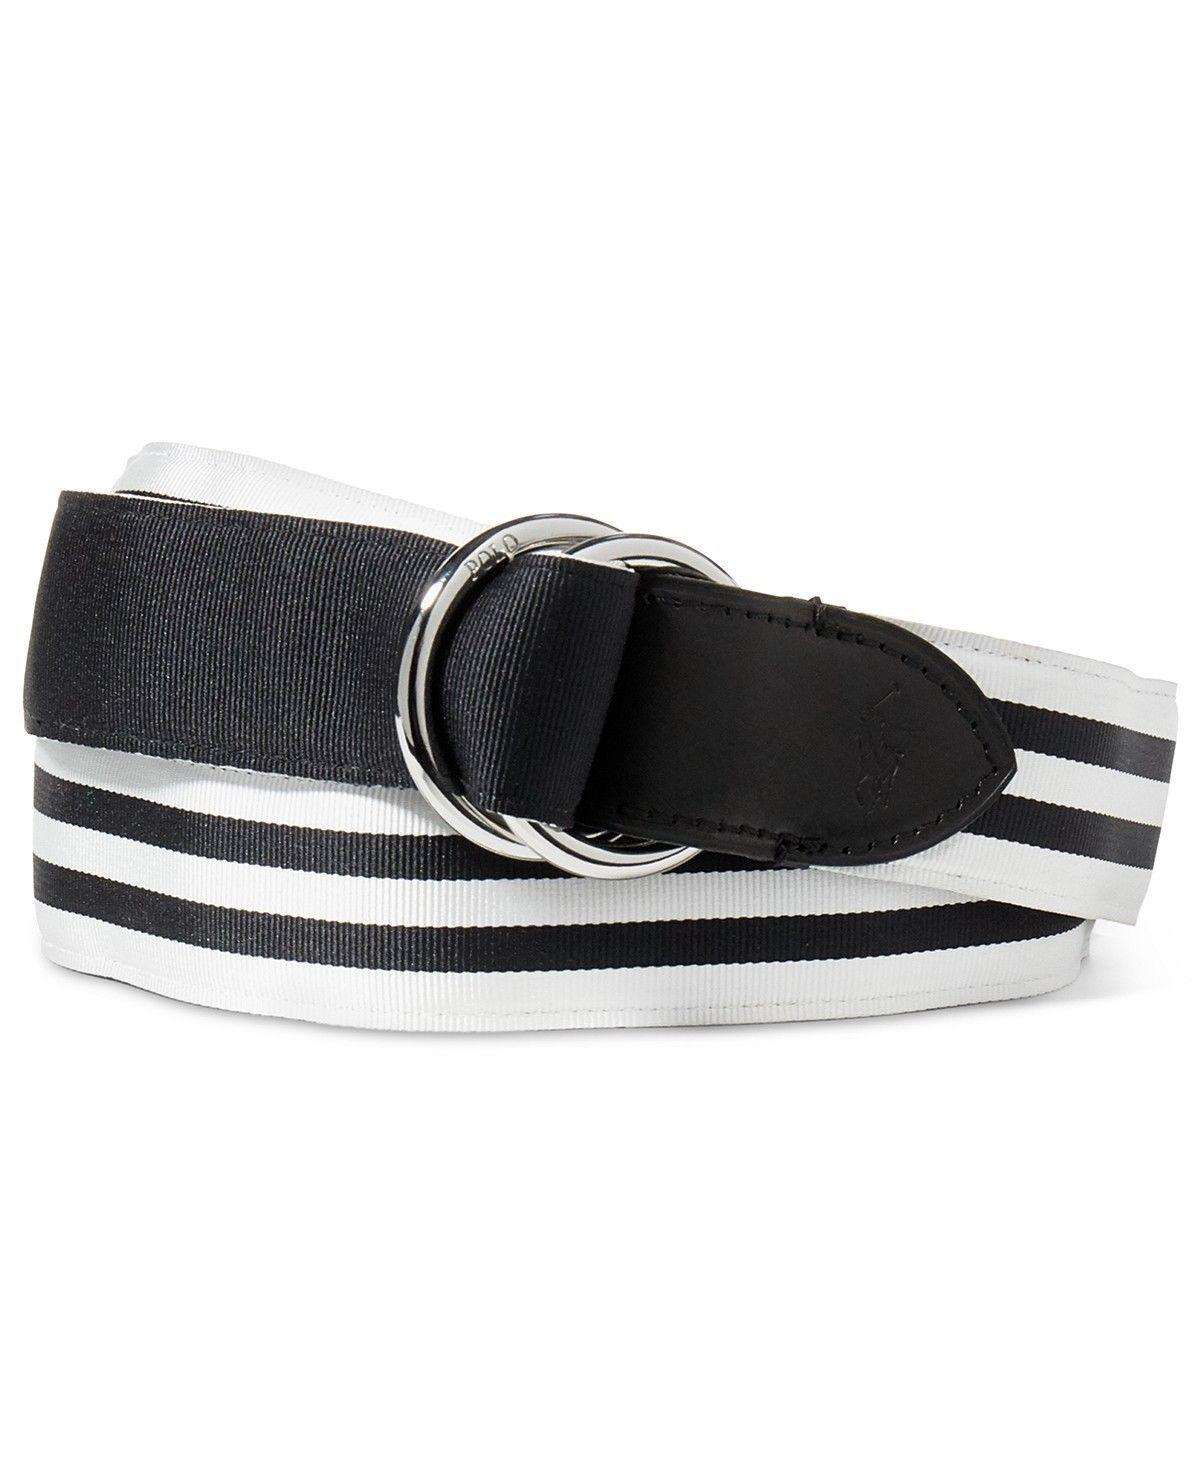 Polo Ralph Lauren Mens Reversible Striped Belt White Black Size Large - 68  -NWT -  29.95 1f225130d41f2